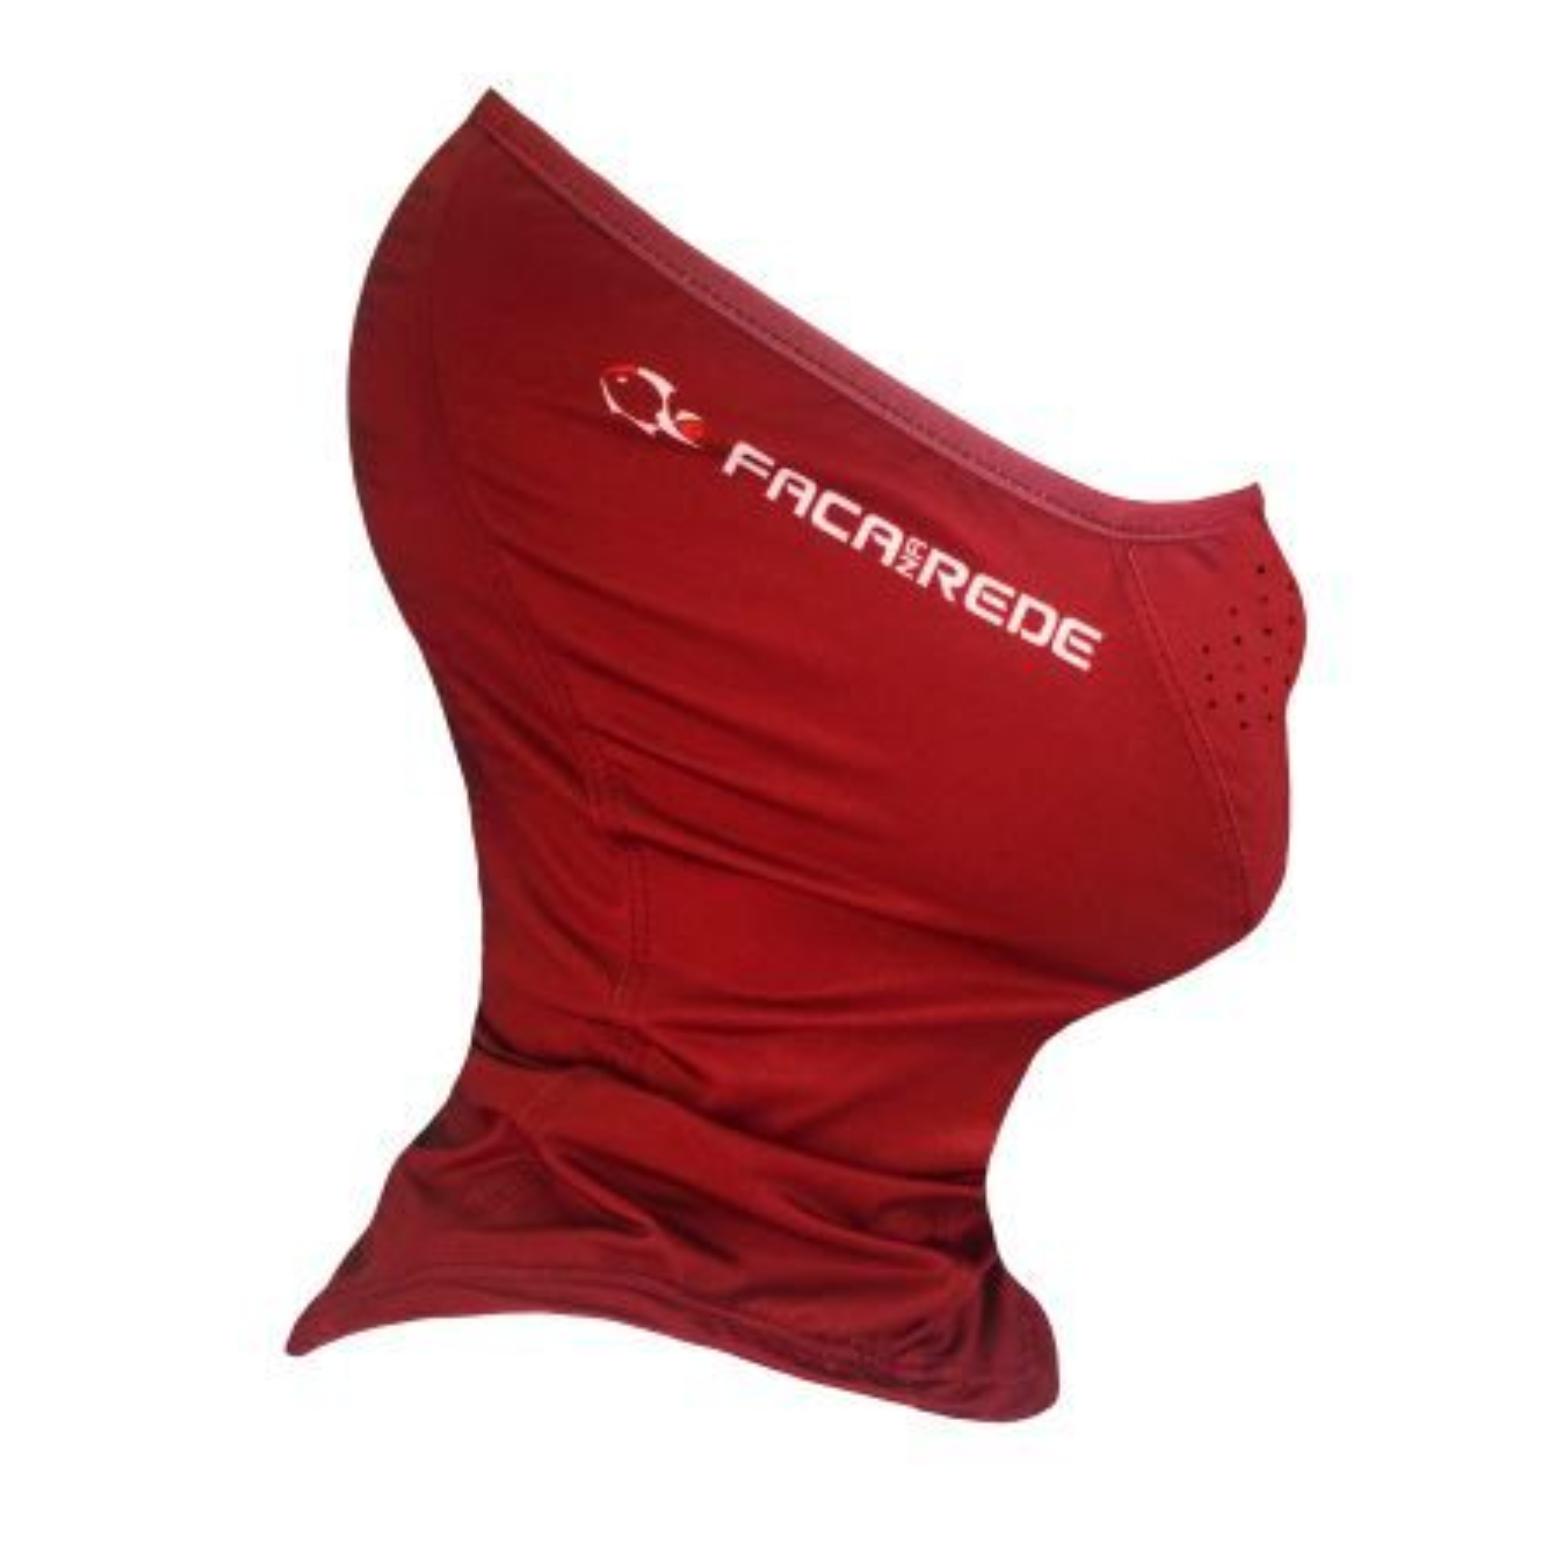 Máscara de Proteção Faca na Rede BN 21 Red